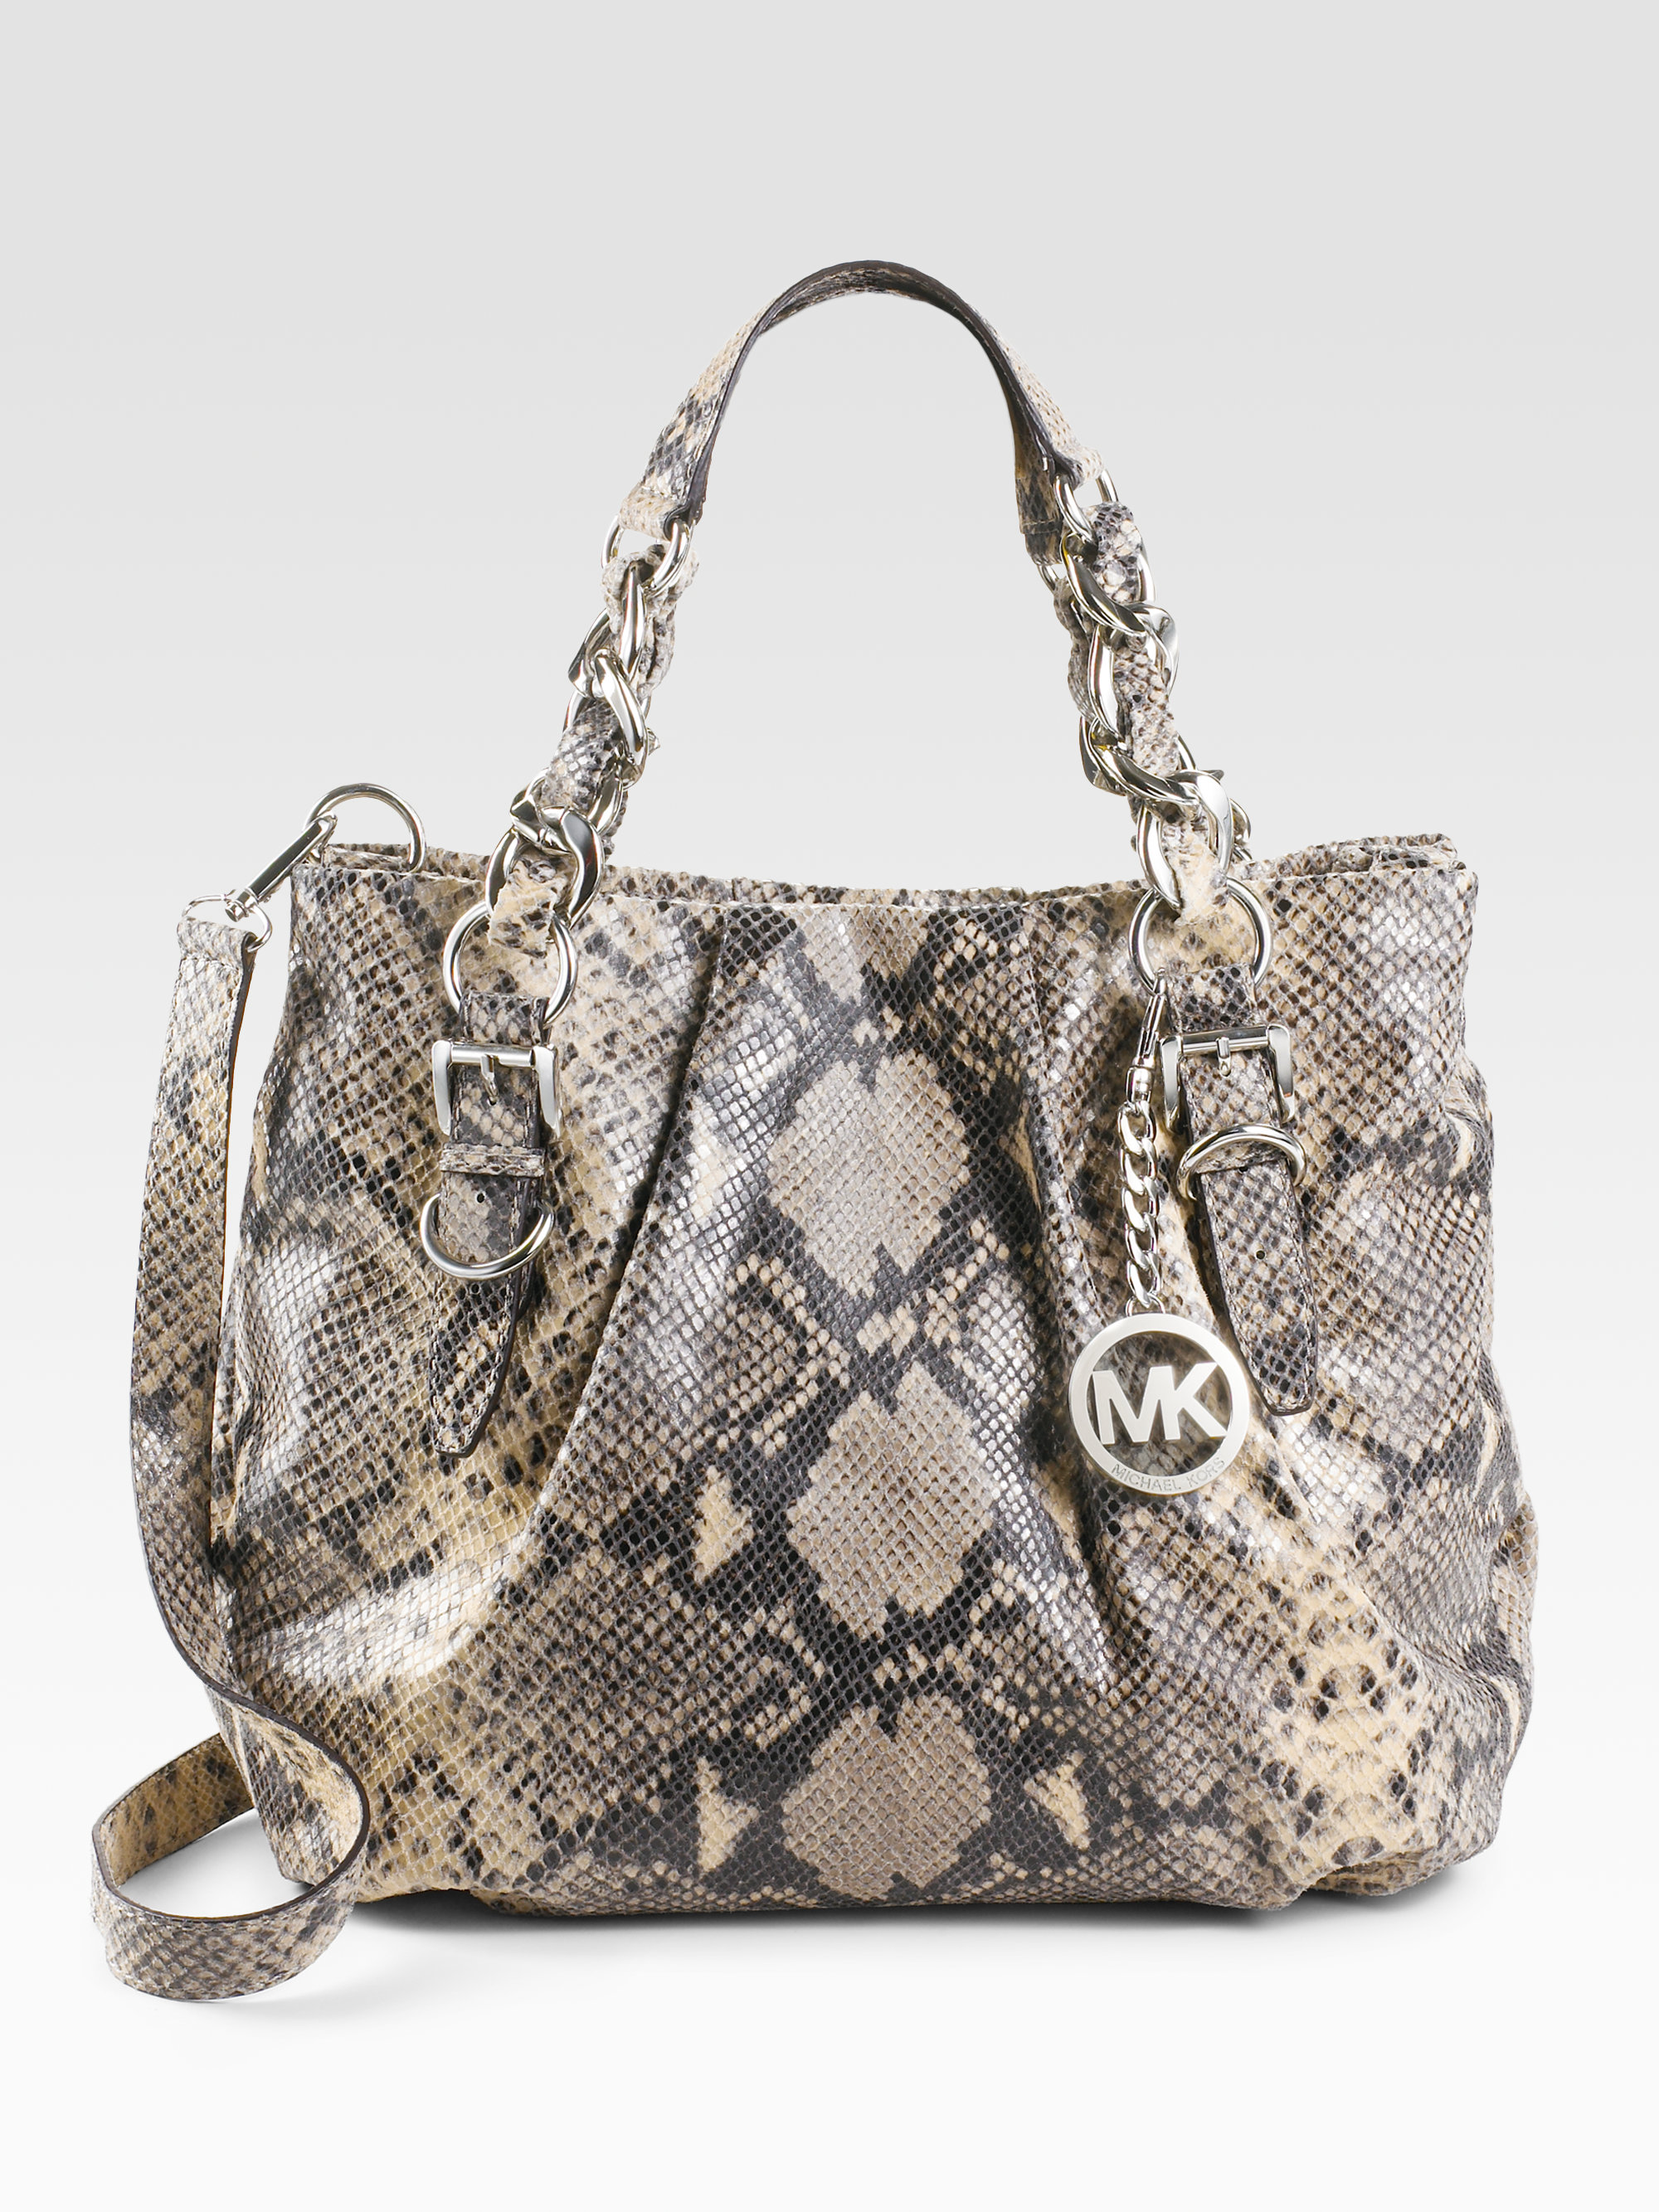 5d96b8975c20 buy michael kors colette python bag 8d868 e3dd0; closeout lyst michael  michael kors embossed python leather tote bag in natural 15dcc ccce5